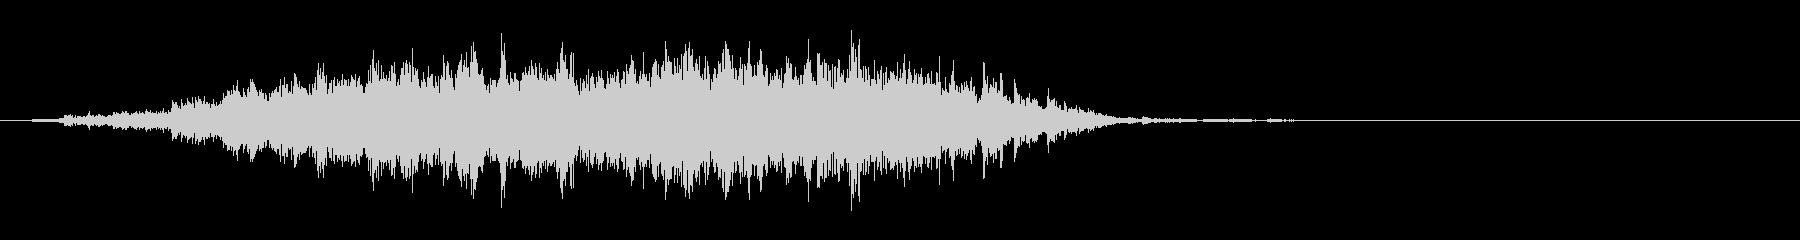 "Phrase sound 2 of the heavy bell sound ""Ekiro""'s unreproduced waveform"